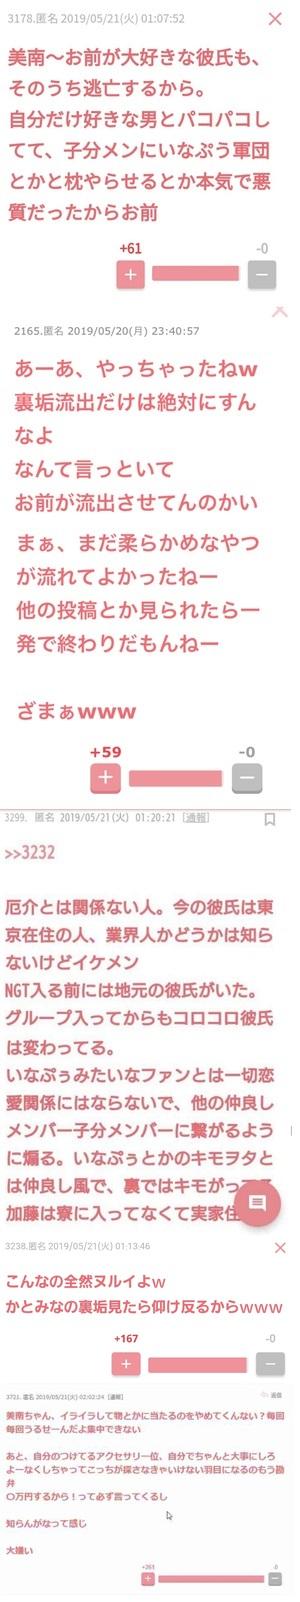 【NGT48暴行事件】ガルちゃんでリーク祭りwww暴行事件のボスは加藤美南だった!?他多数